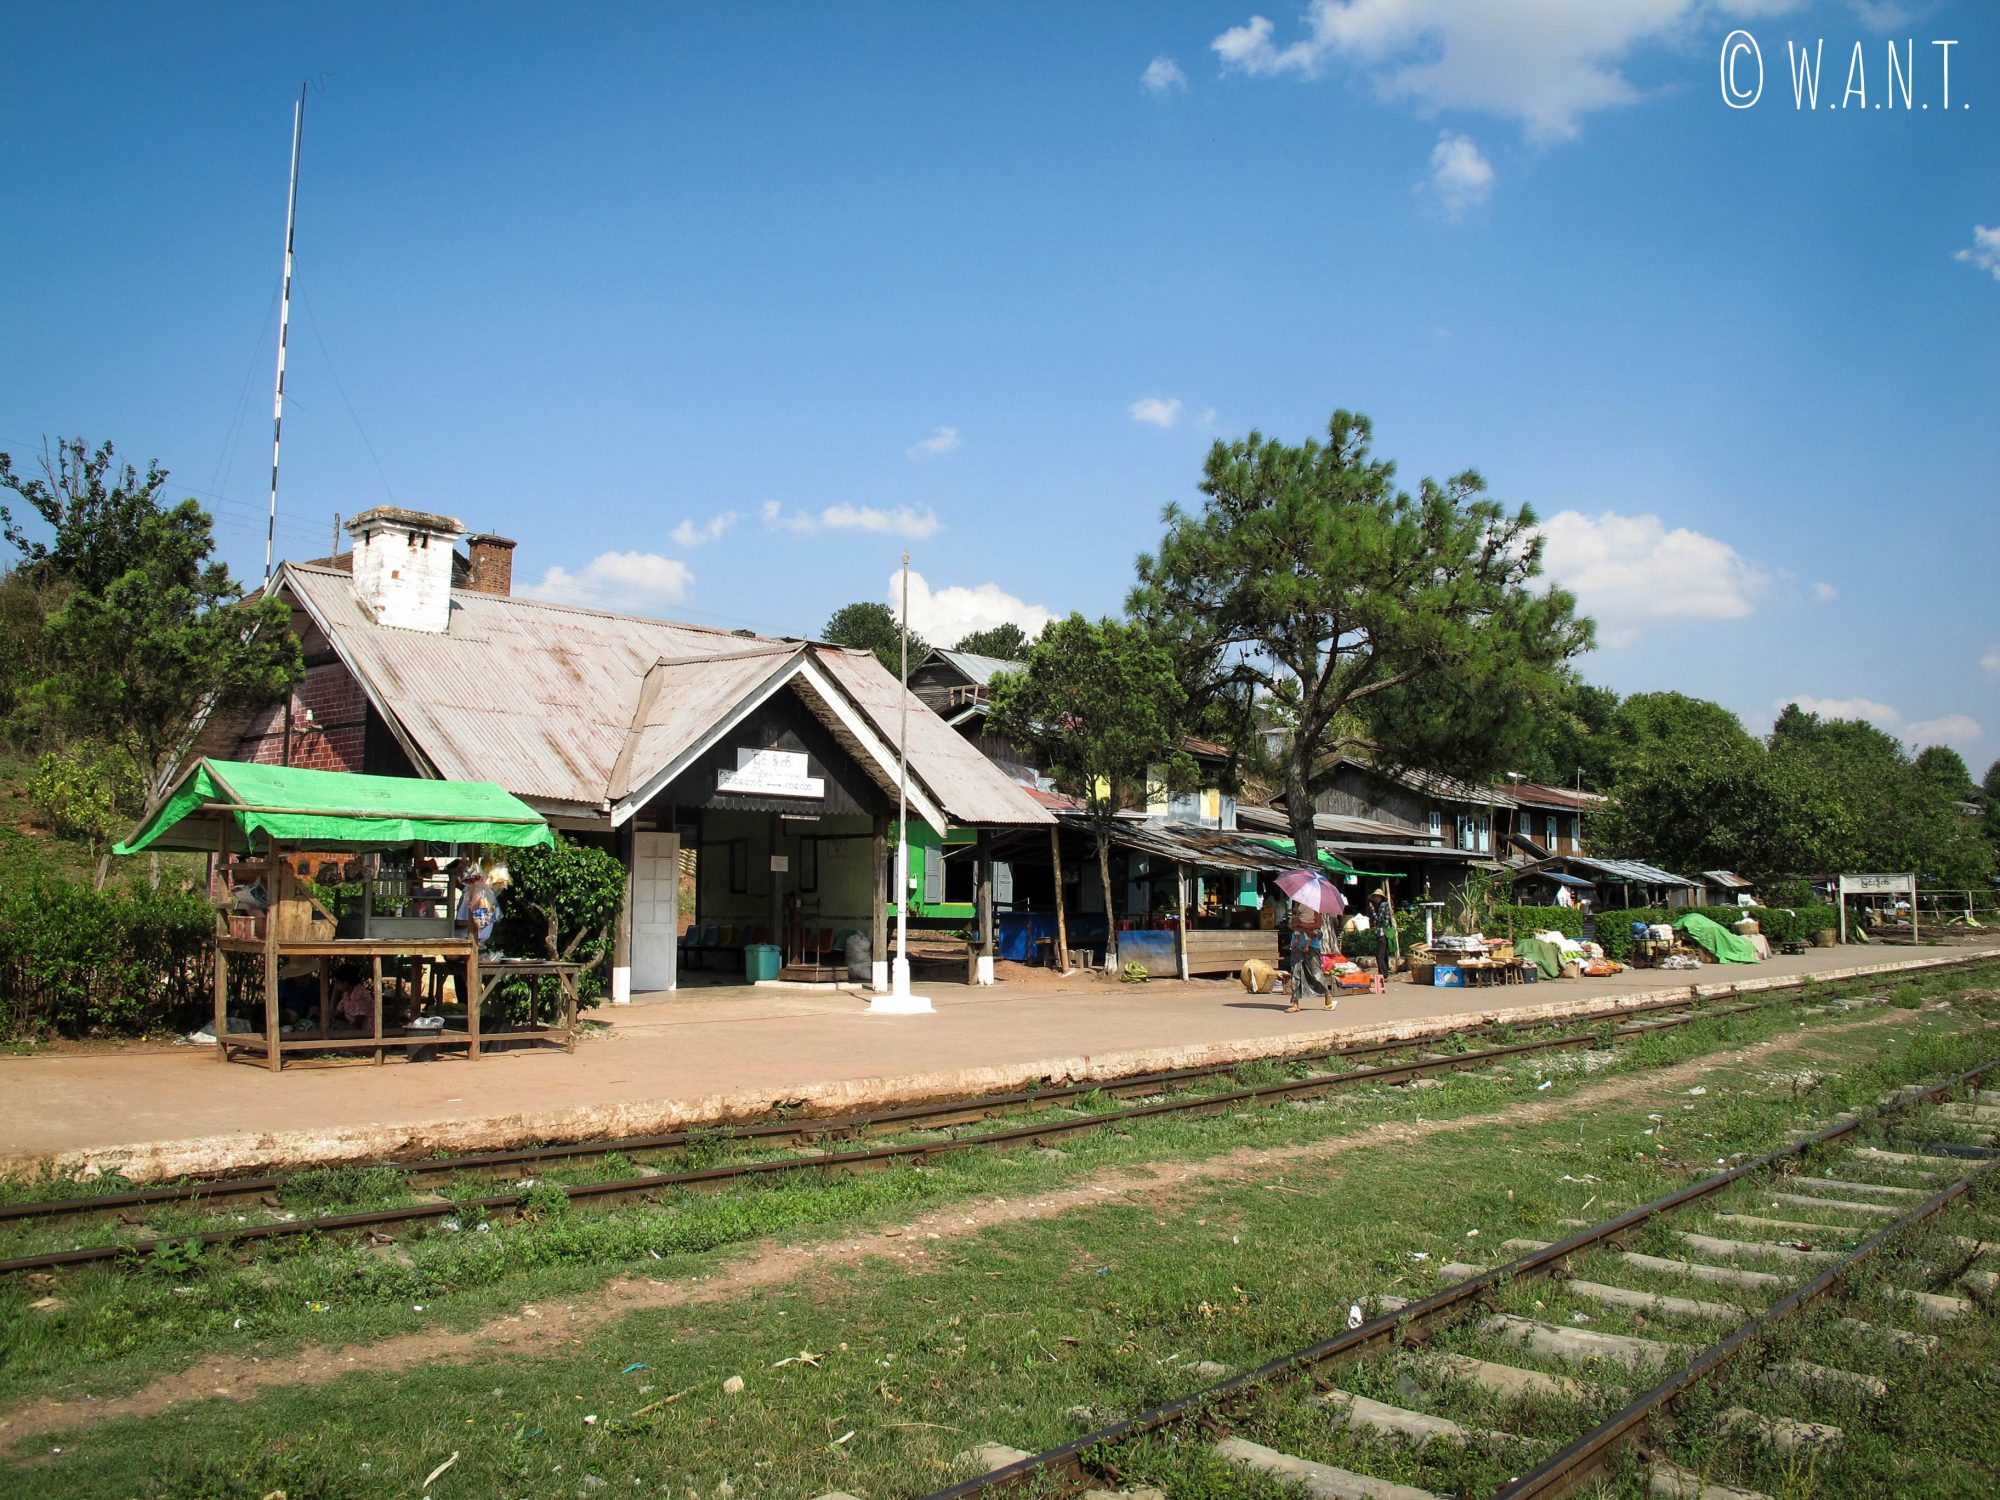 Gare au milieu de la campagne où toute la vie locale s'anime